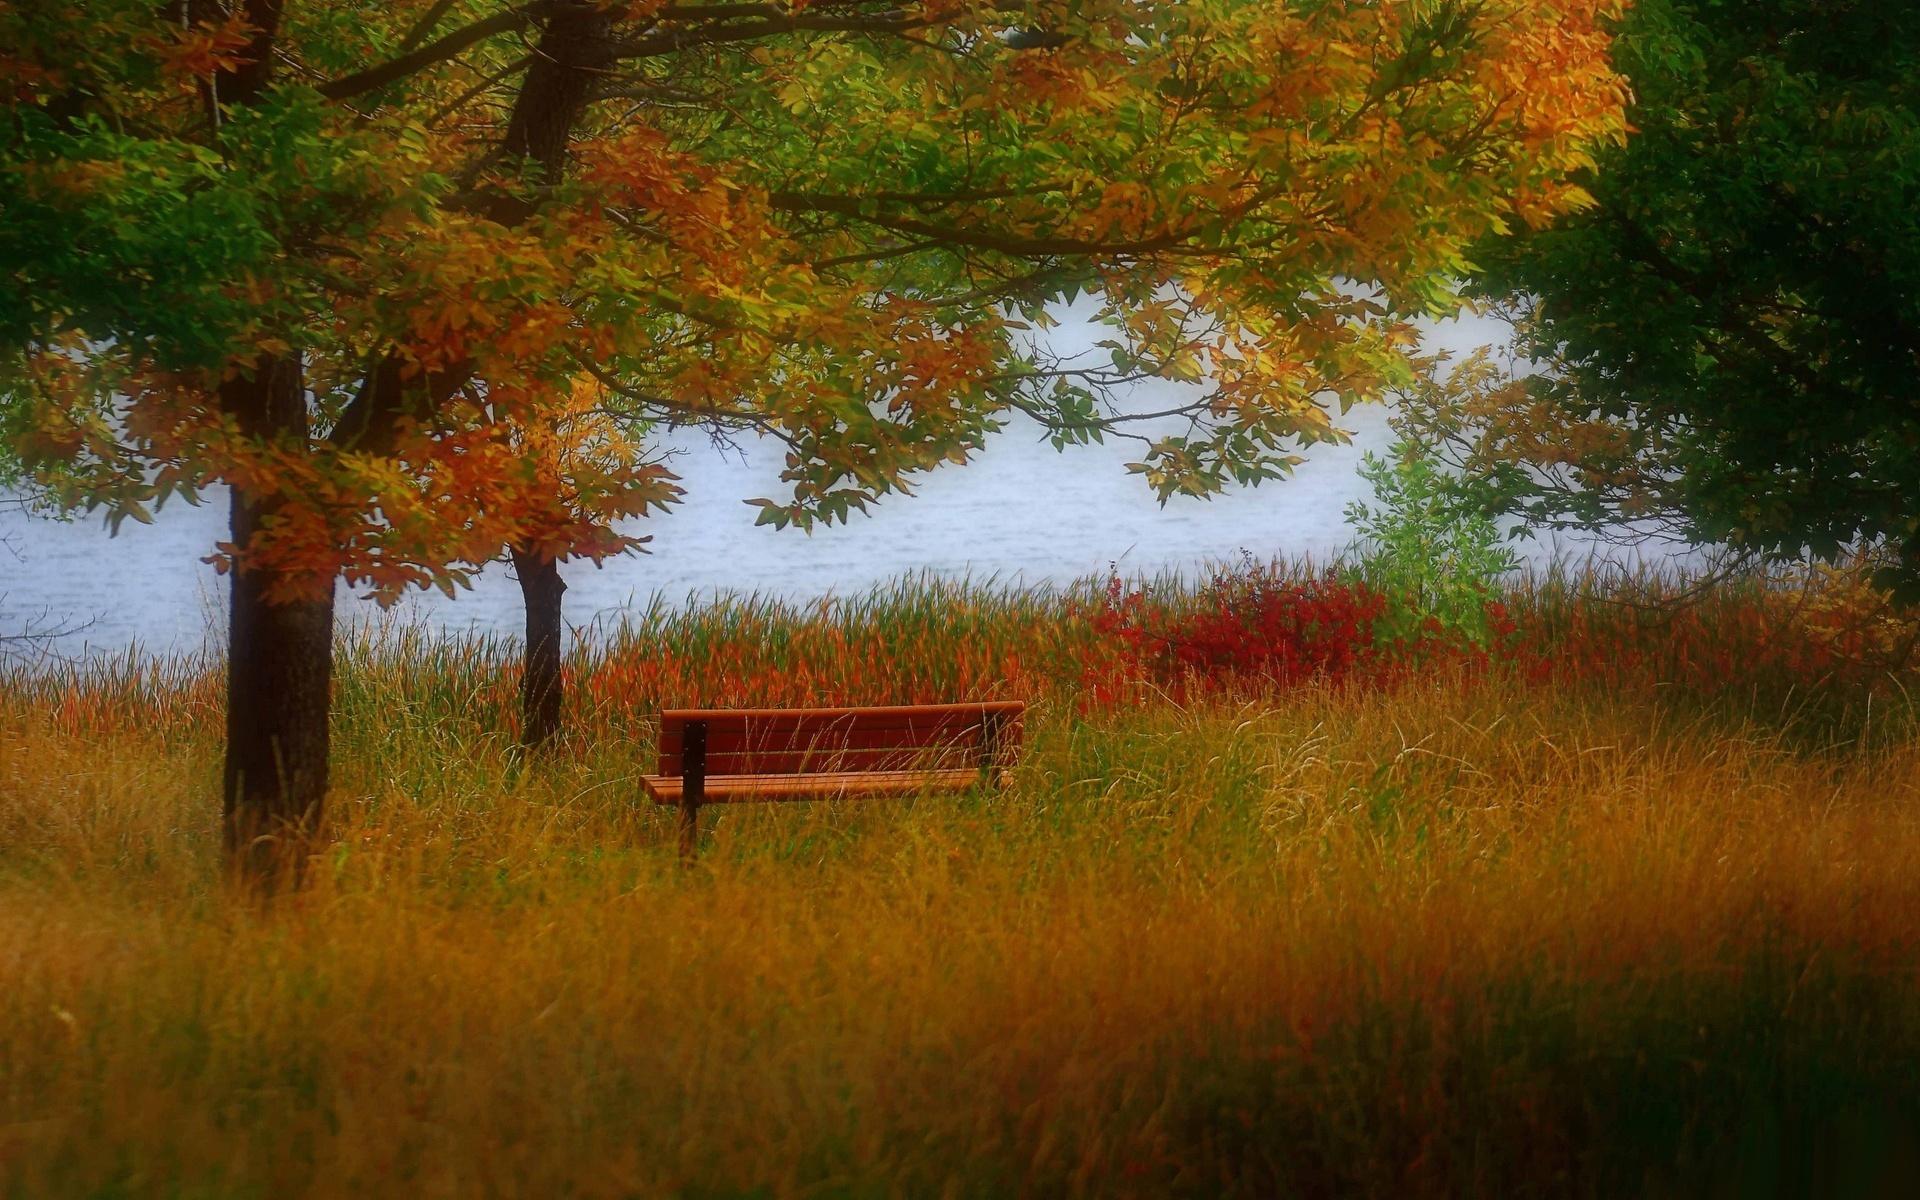 Handy-Wallpaper Landschaft, Flüsse, Bäume, Grass, Herbst kostenlos herunterladen.